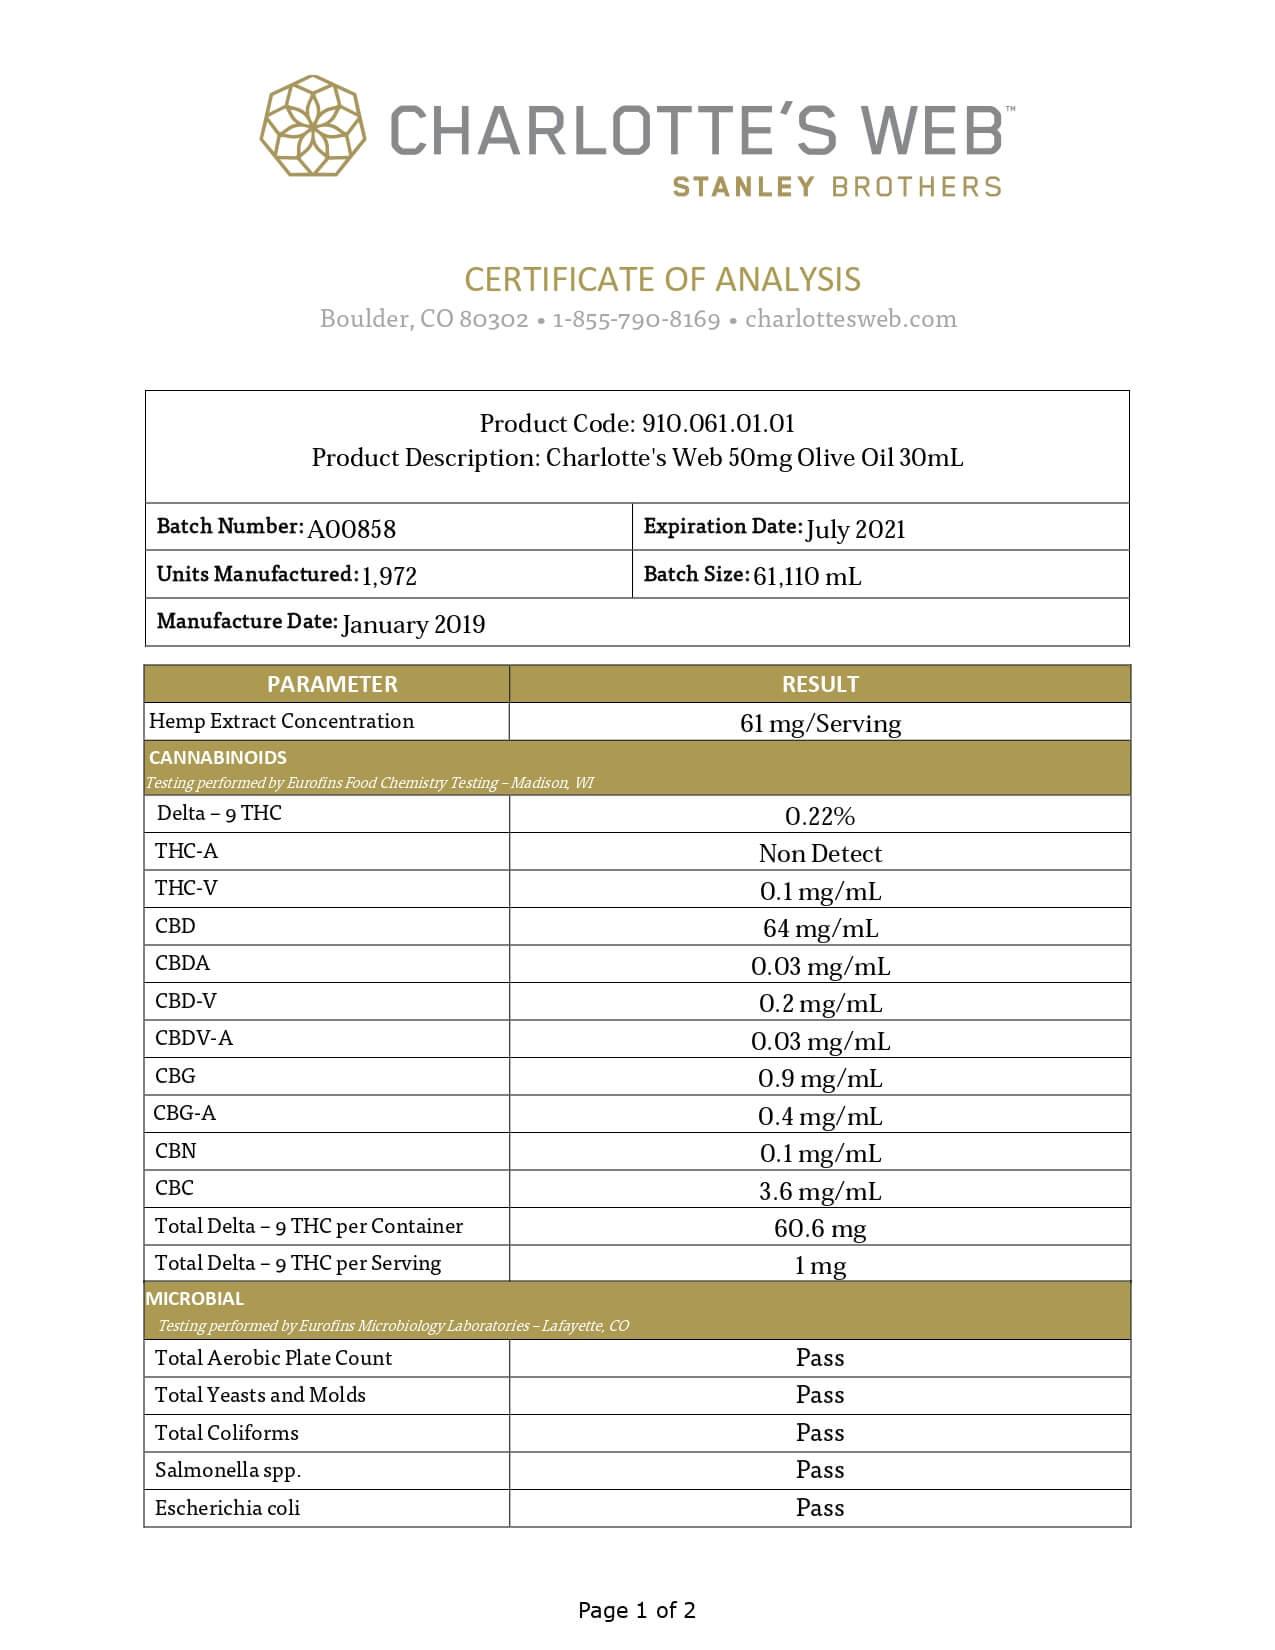 Charlottes Web Original Formula Olive Oil (Natural) Lab Report